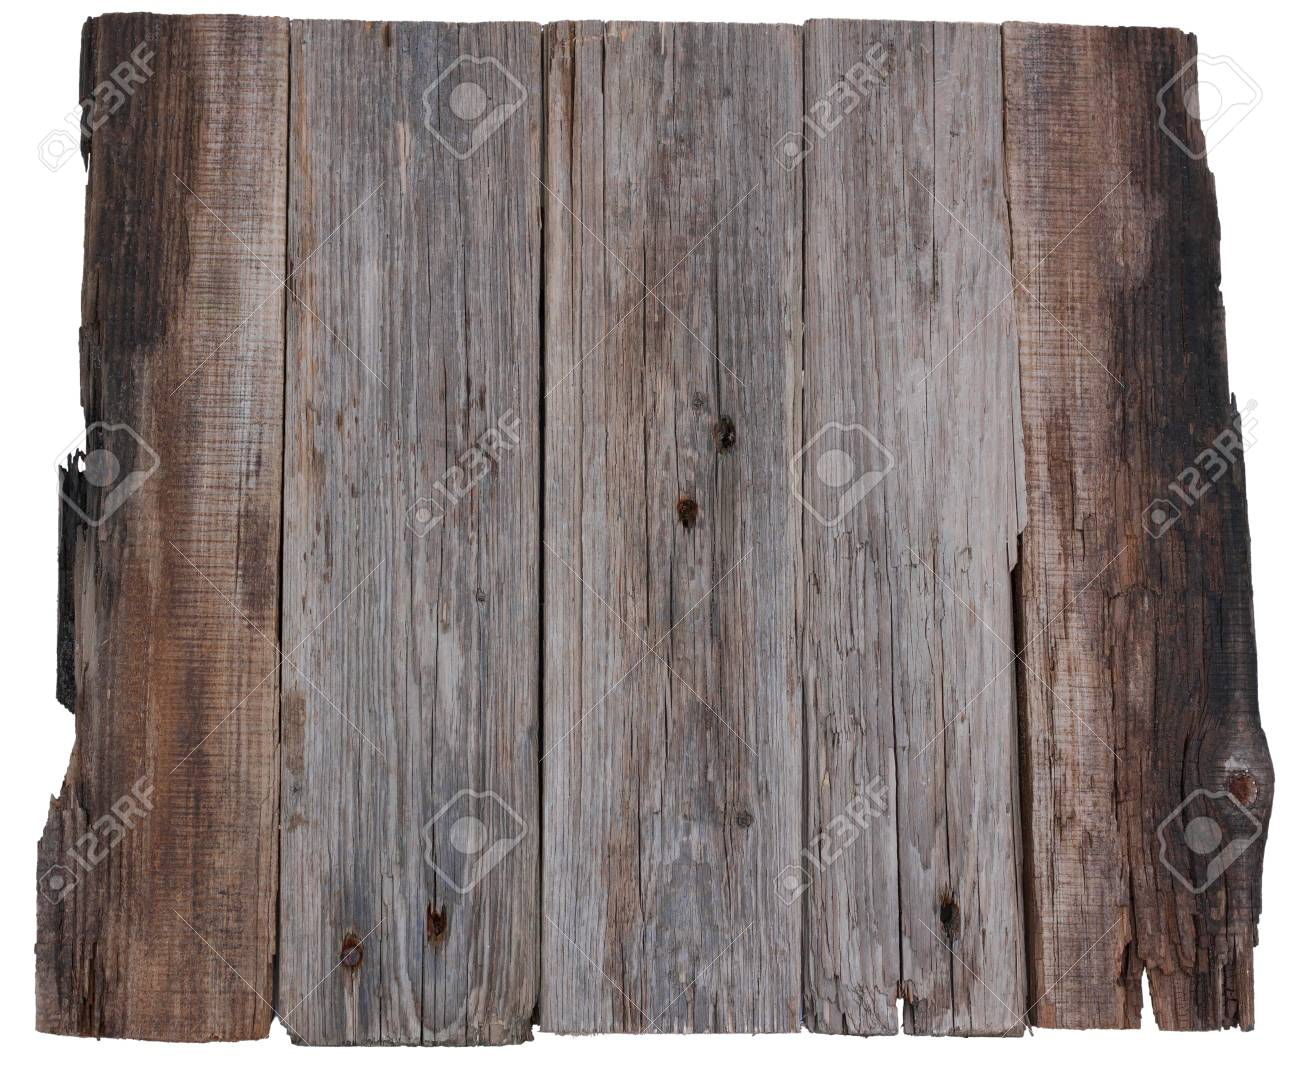 Uitgelezene Houten Plank Oude Planken Geïsoleerde Witte Achtergrond Royalty XF-32